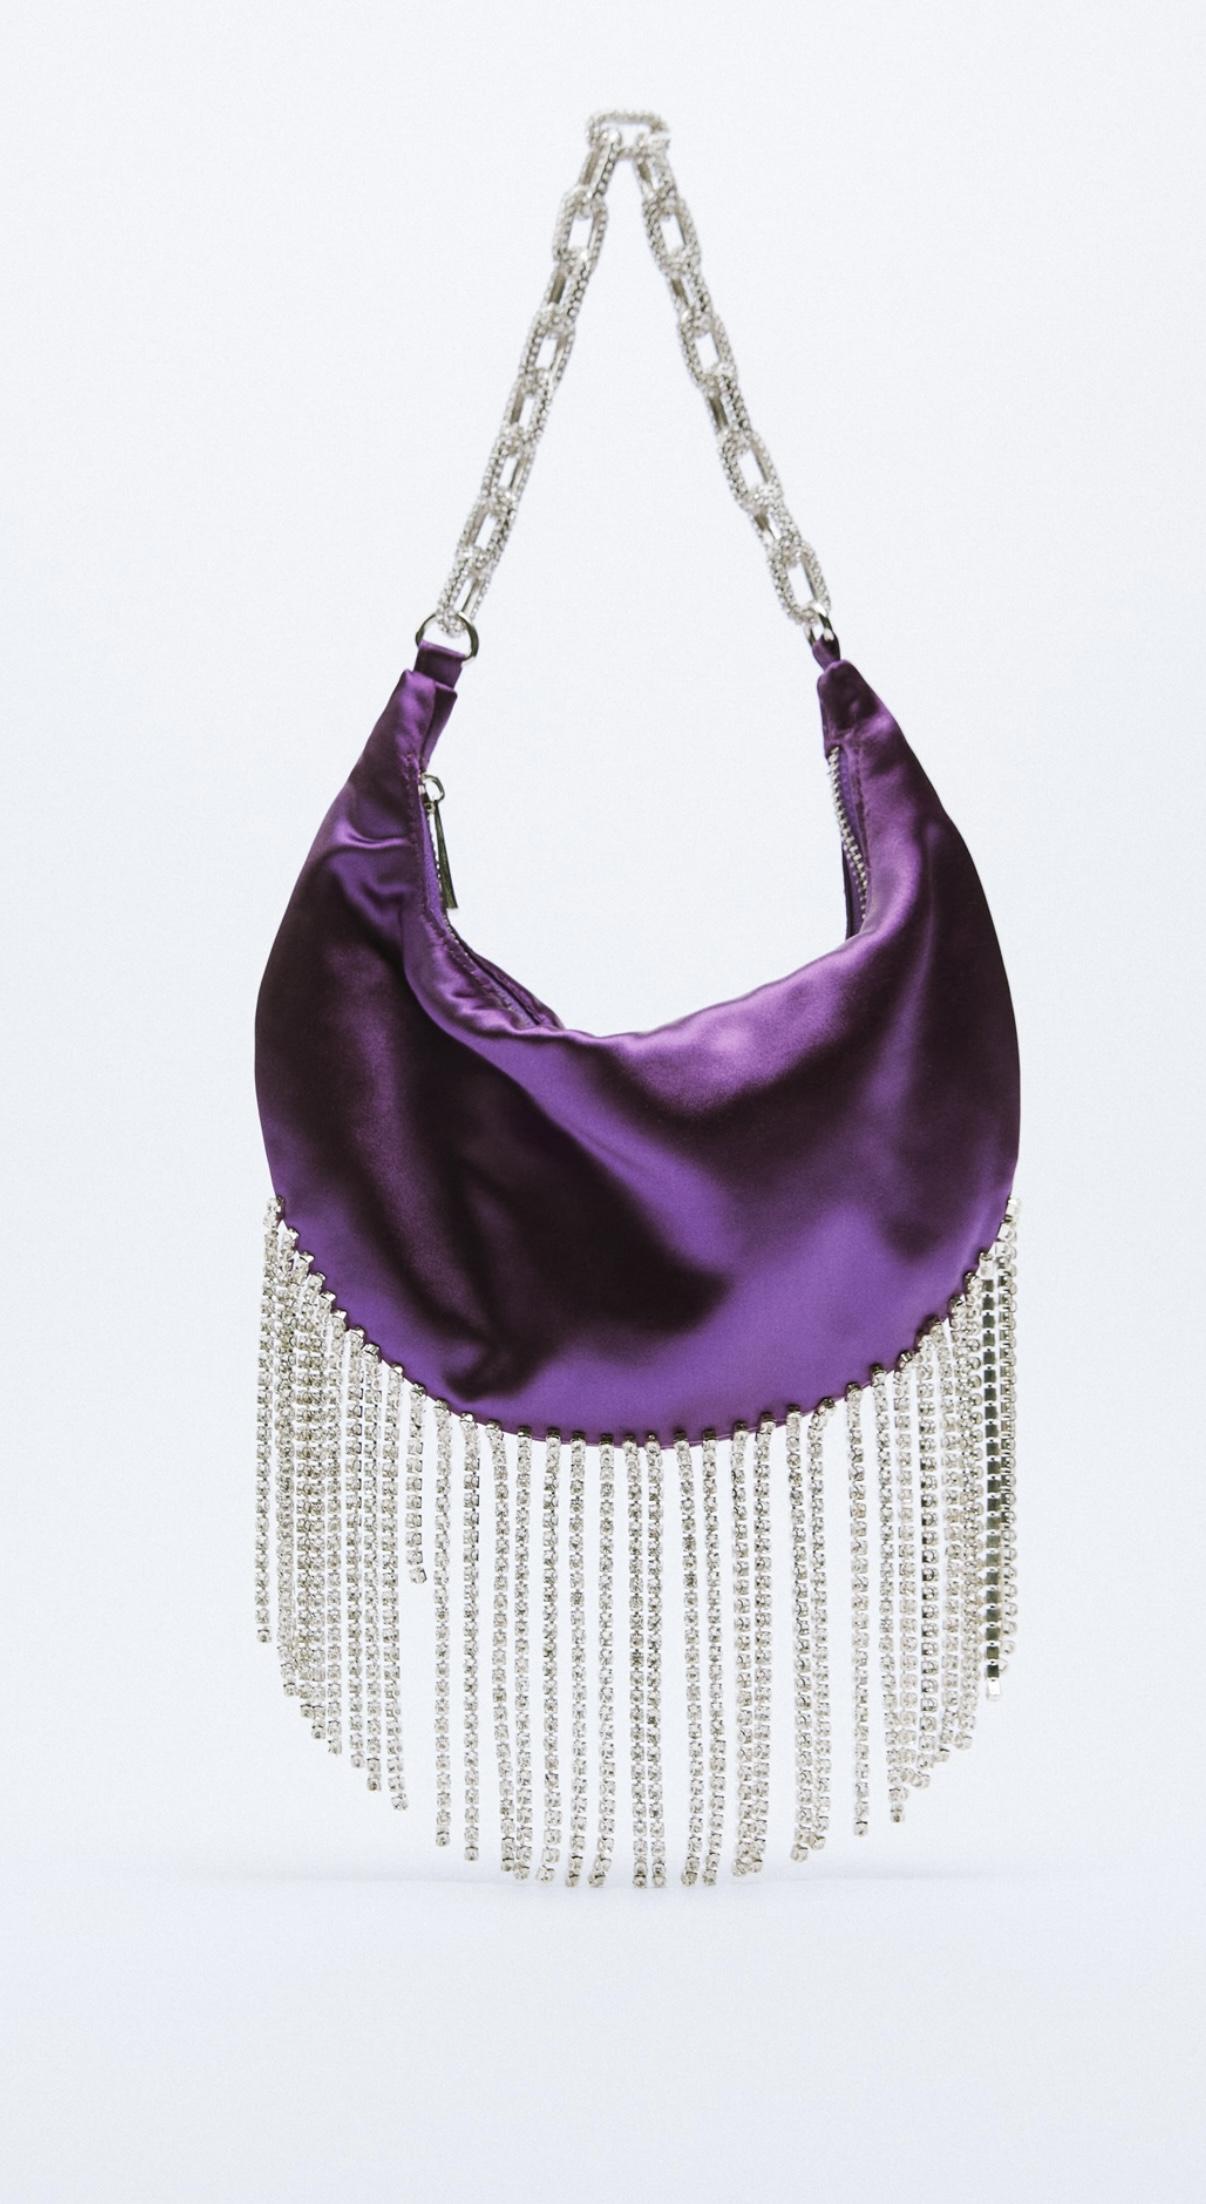 Zara, 1 899 грн